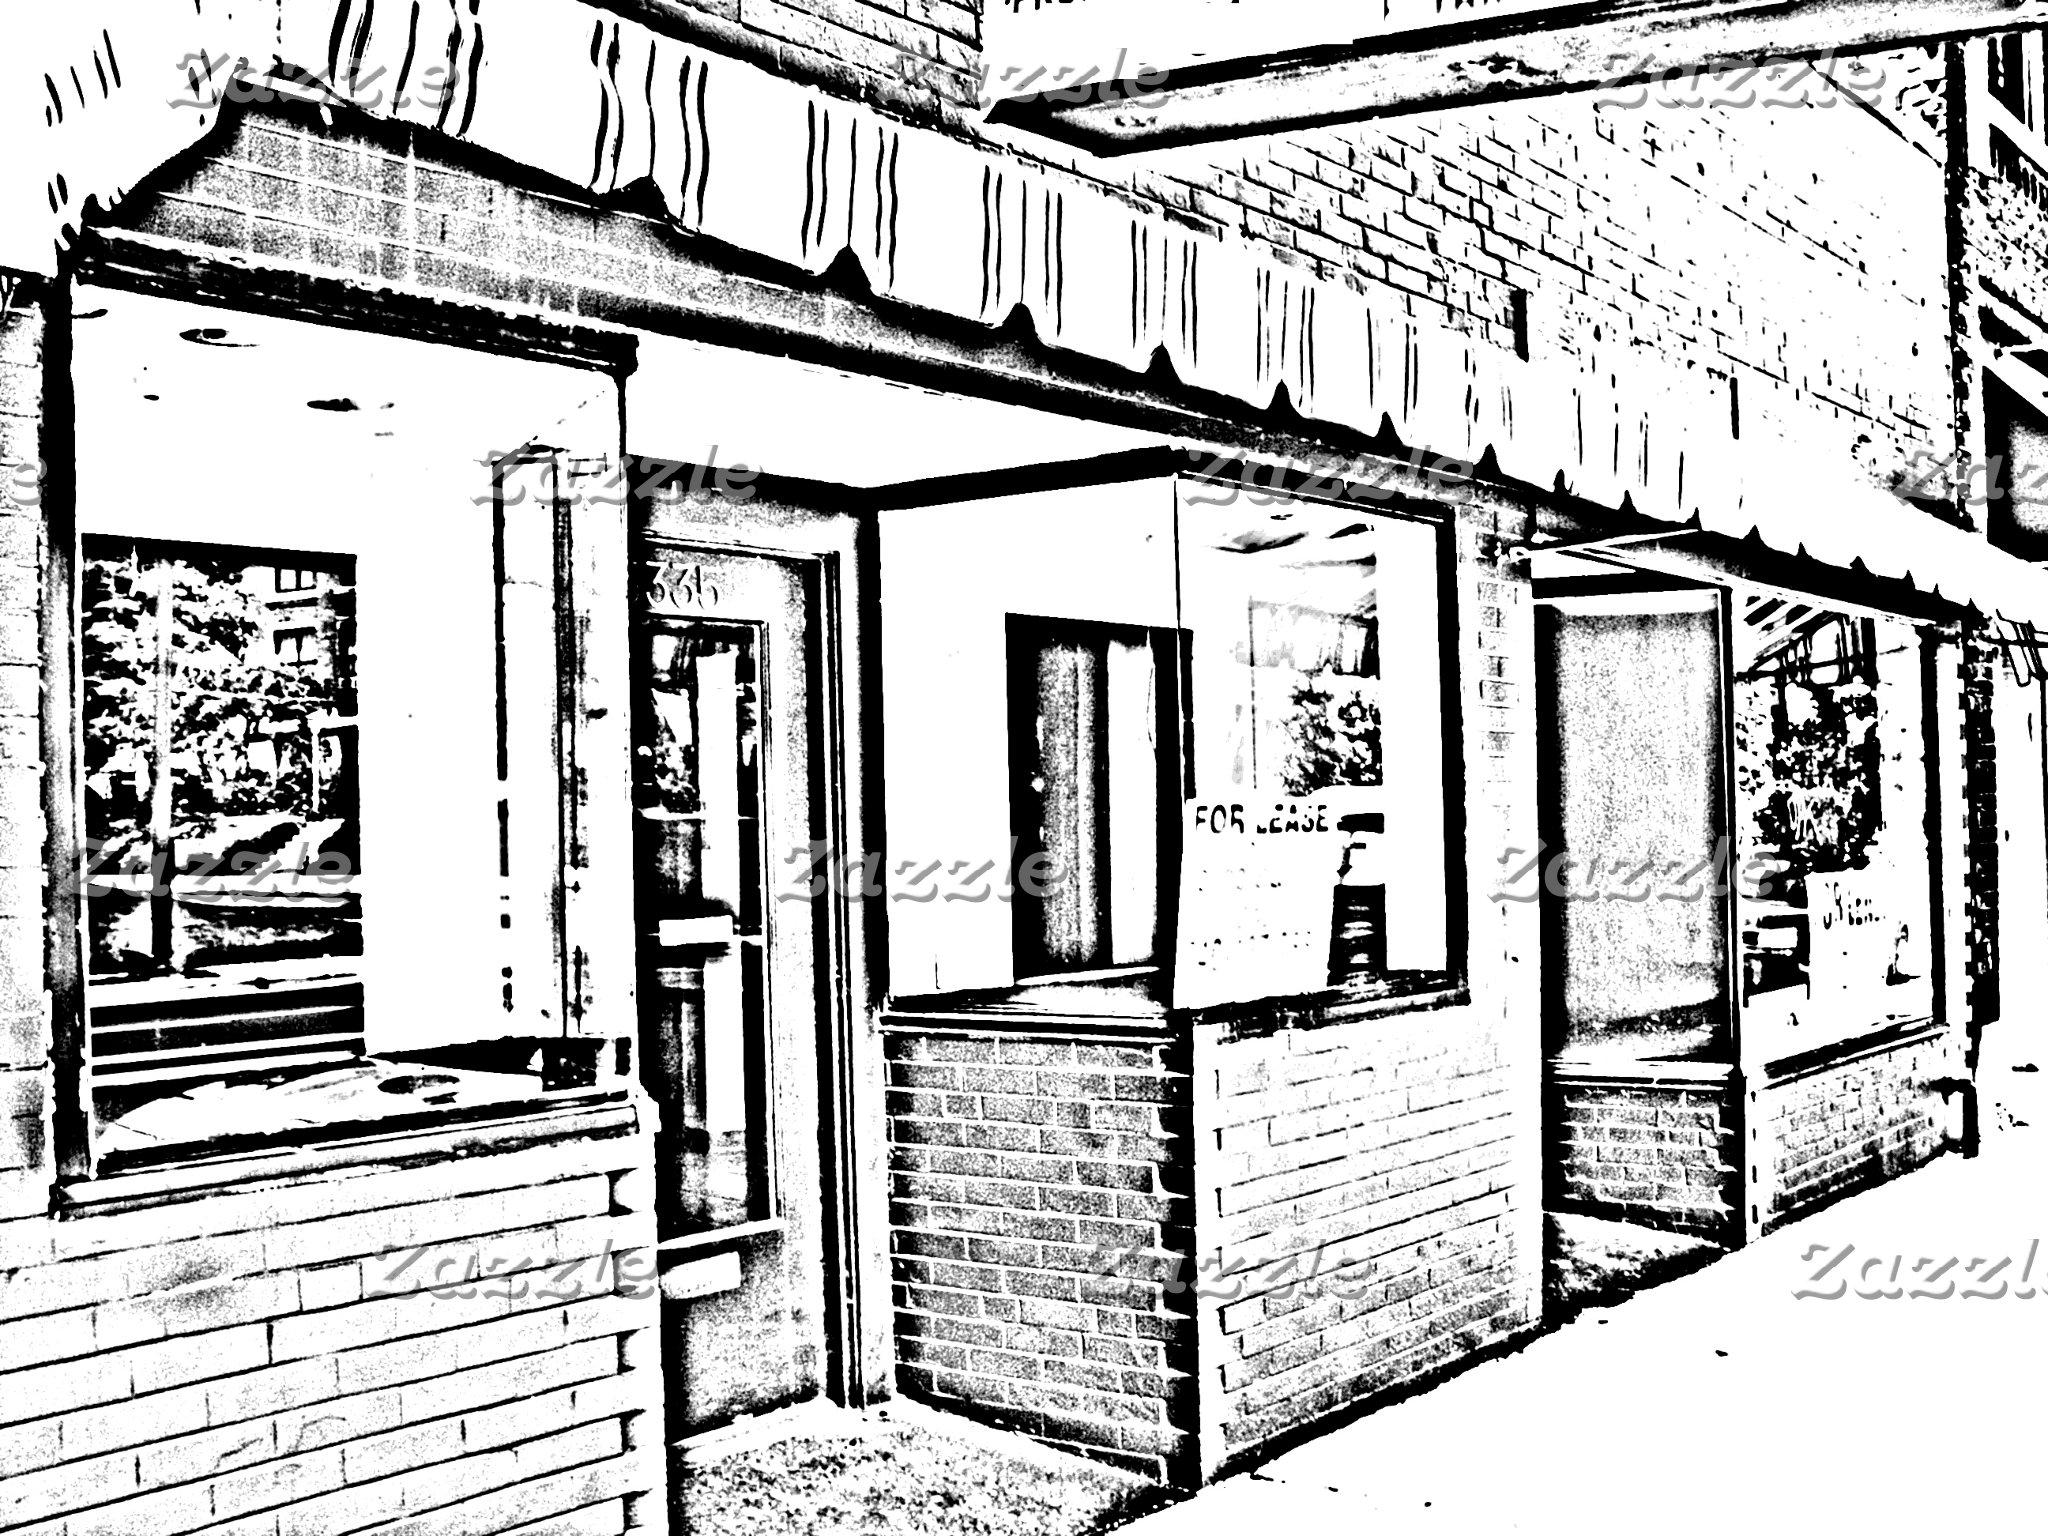 Older Clintonville Storefronts, Columbus, Ohio